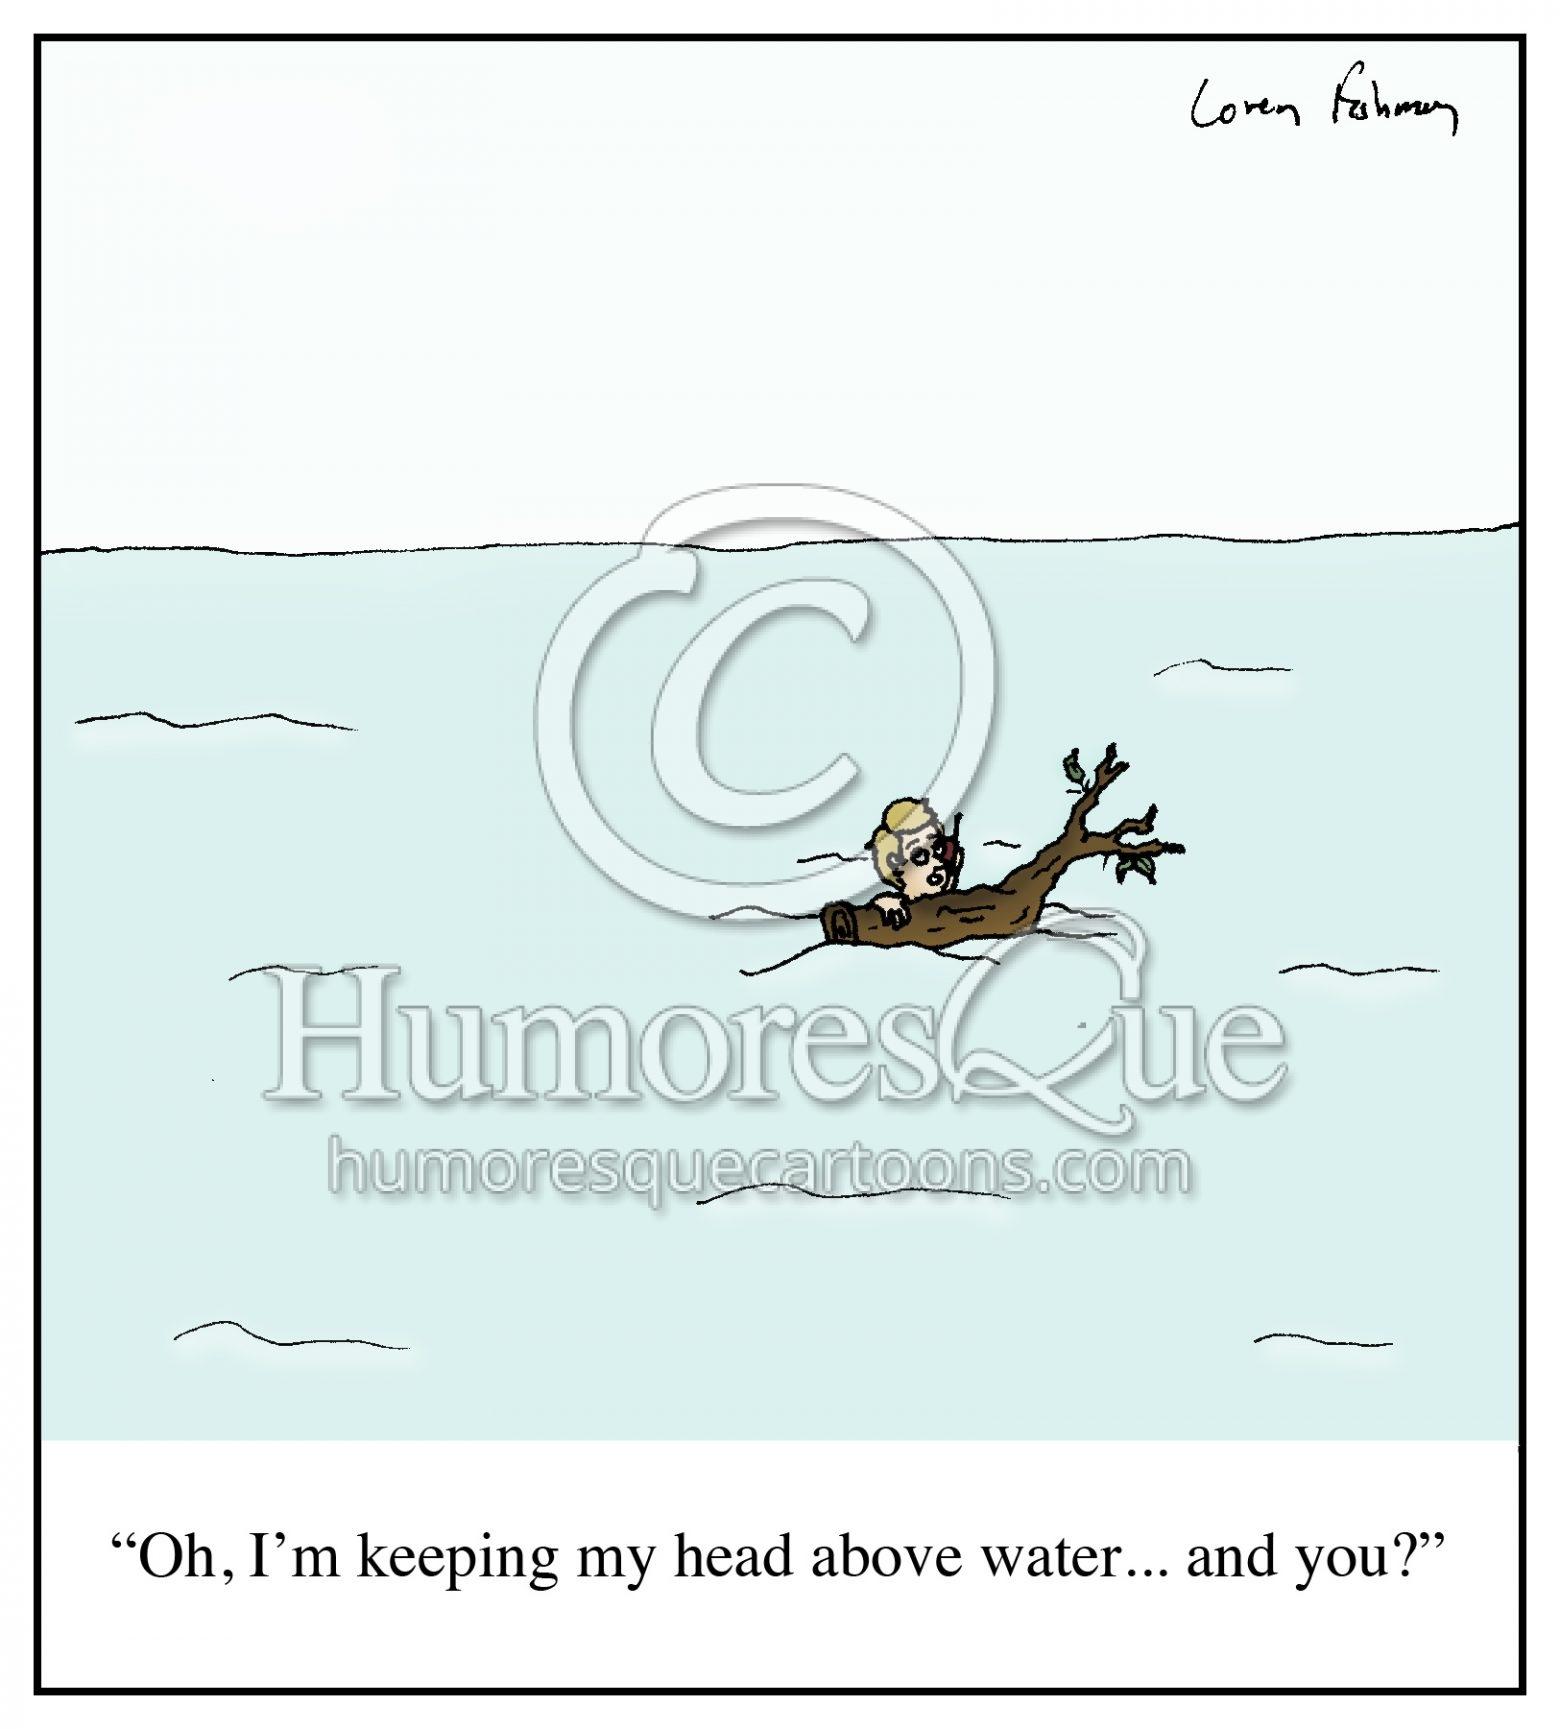 head above water debt financial trouble water cartoon